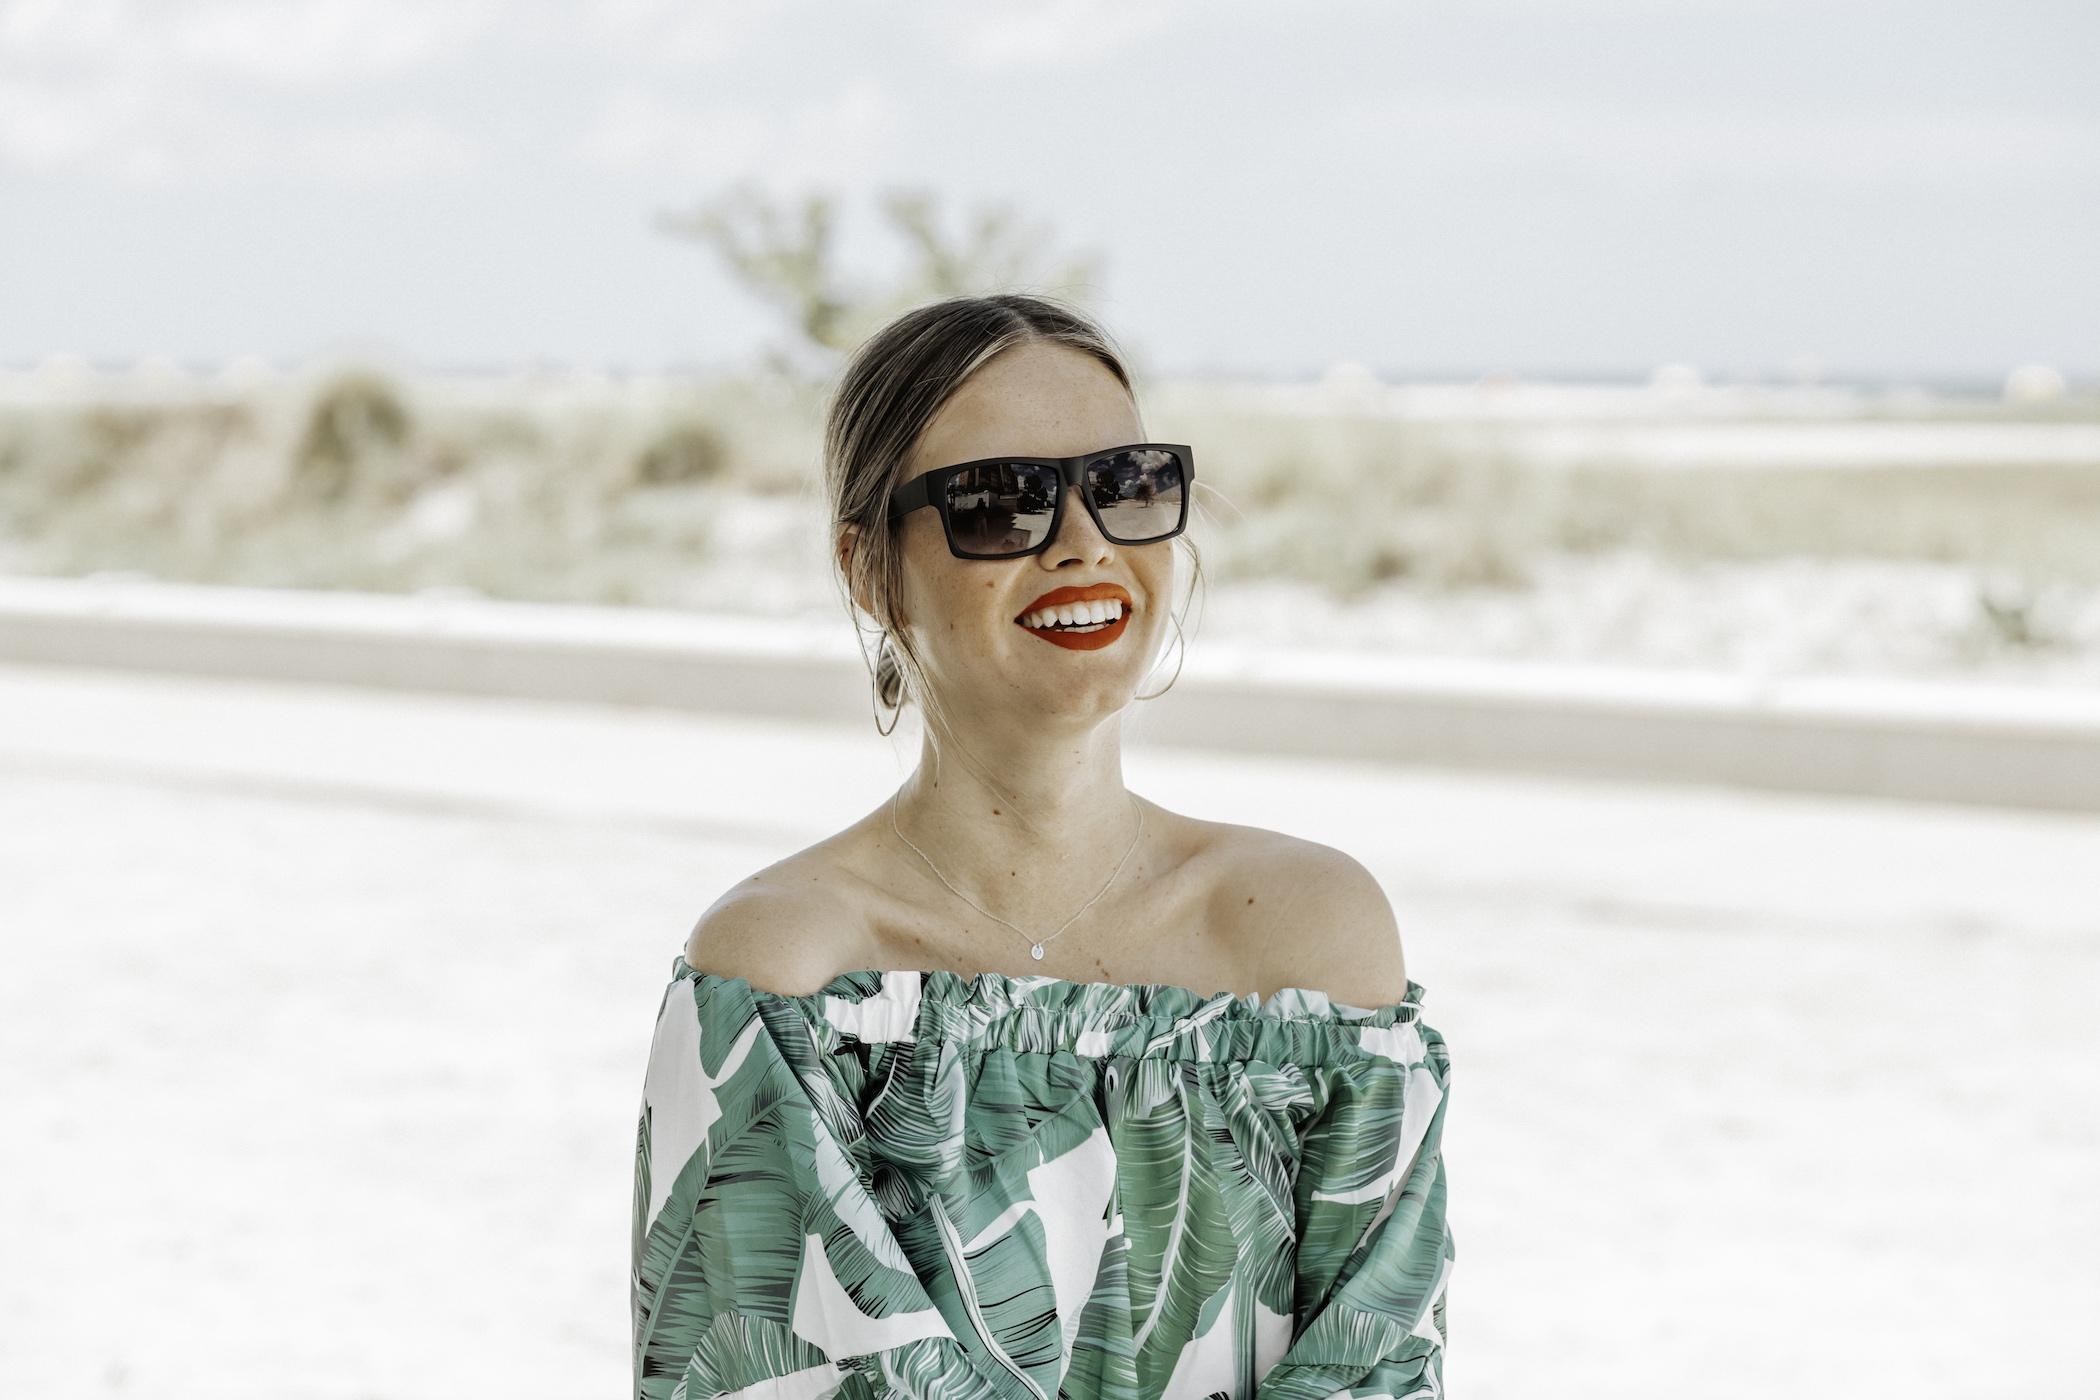 shadyveu-sunglasses-matte-black-ashlee-rose-photography-tiny-ashe-blog-sunglasses-florida-tampa-summer-shadyveu_2-small.jpg